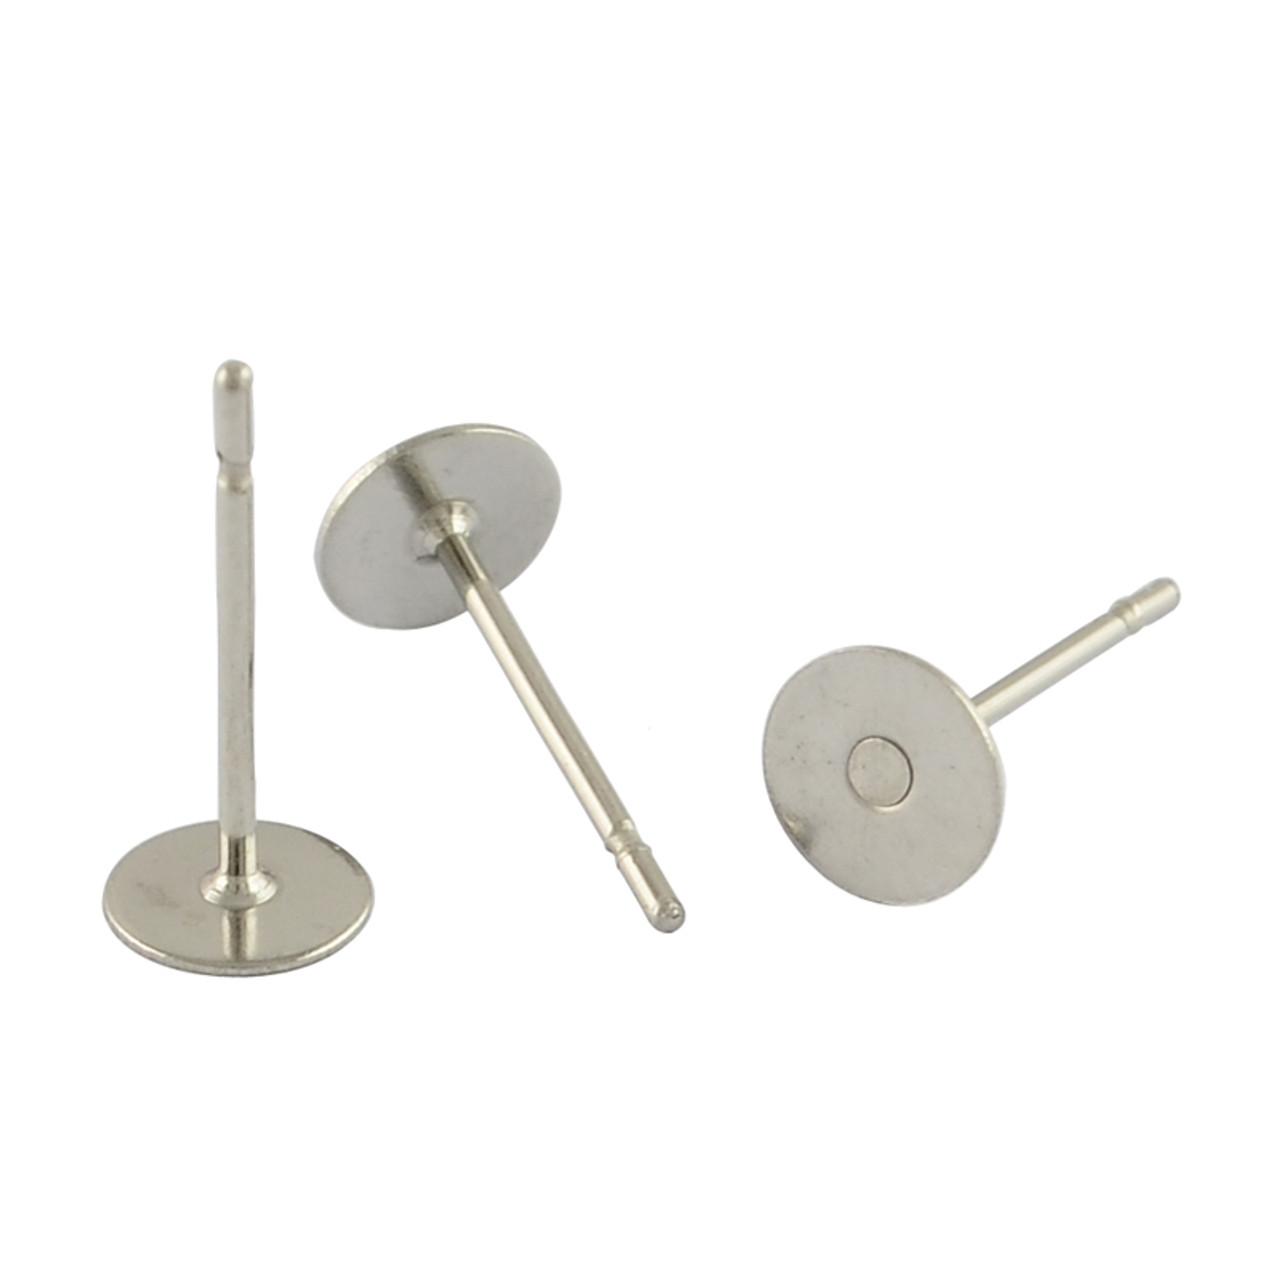 4mm Stainless Steel Flat Post Earrings (4 Pairs)